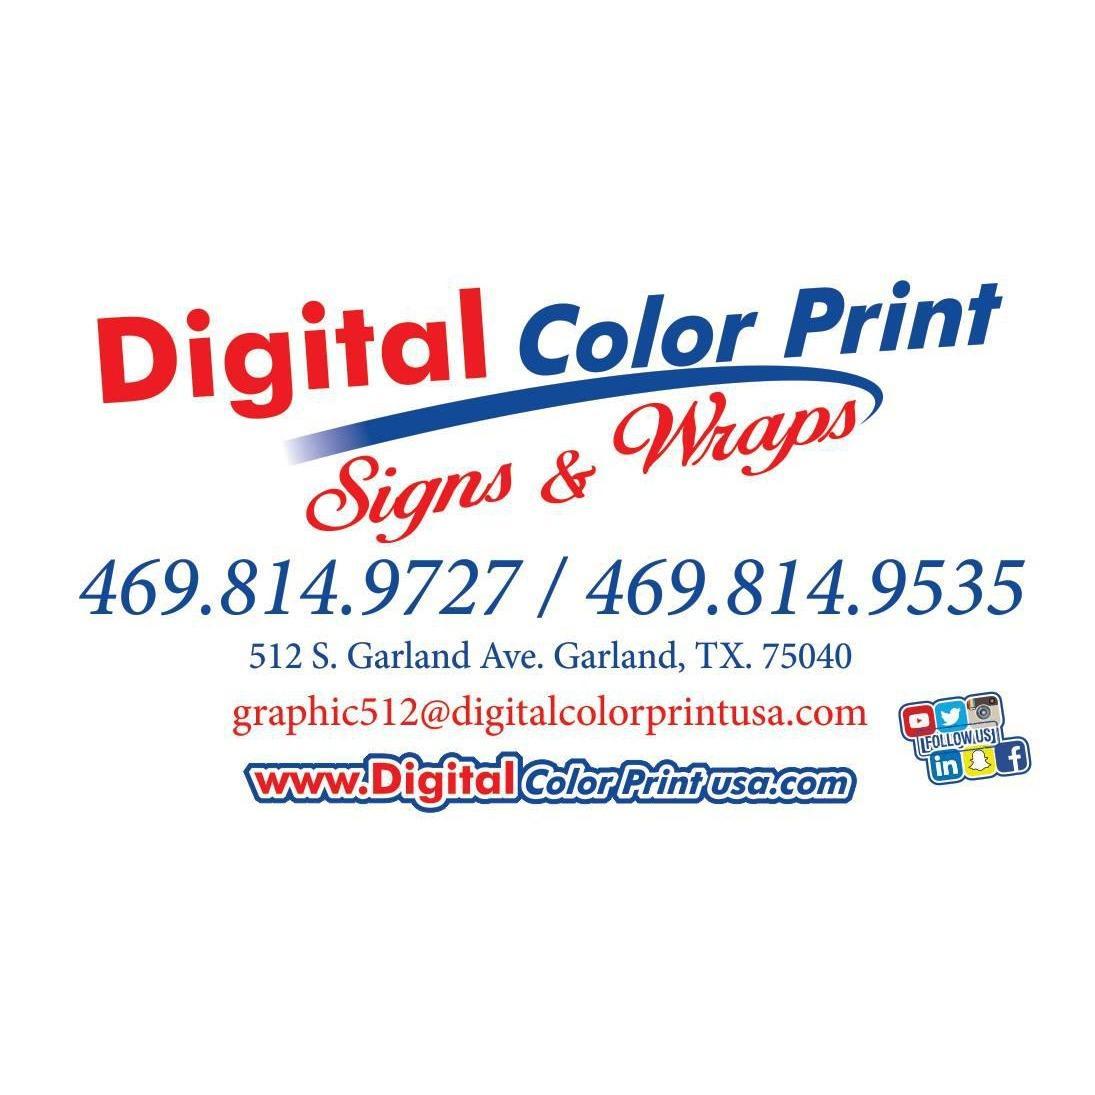 DCP Signs & Wrap / Digital Color Print